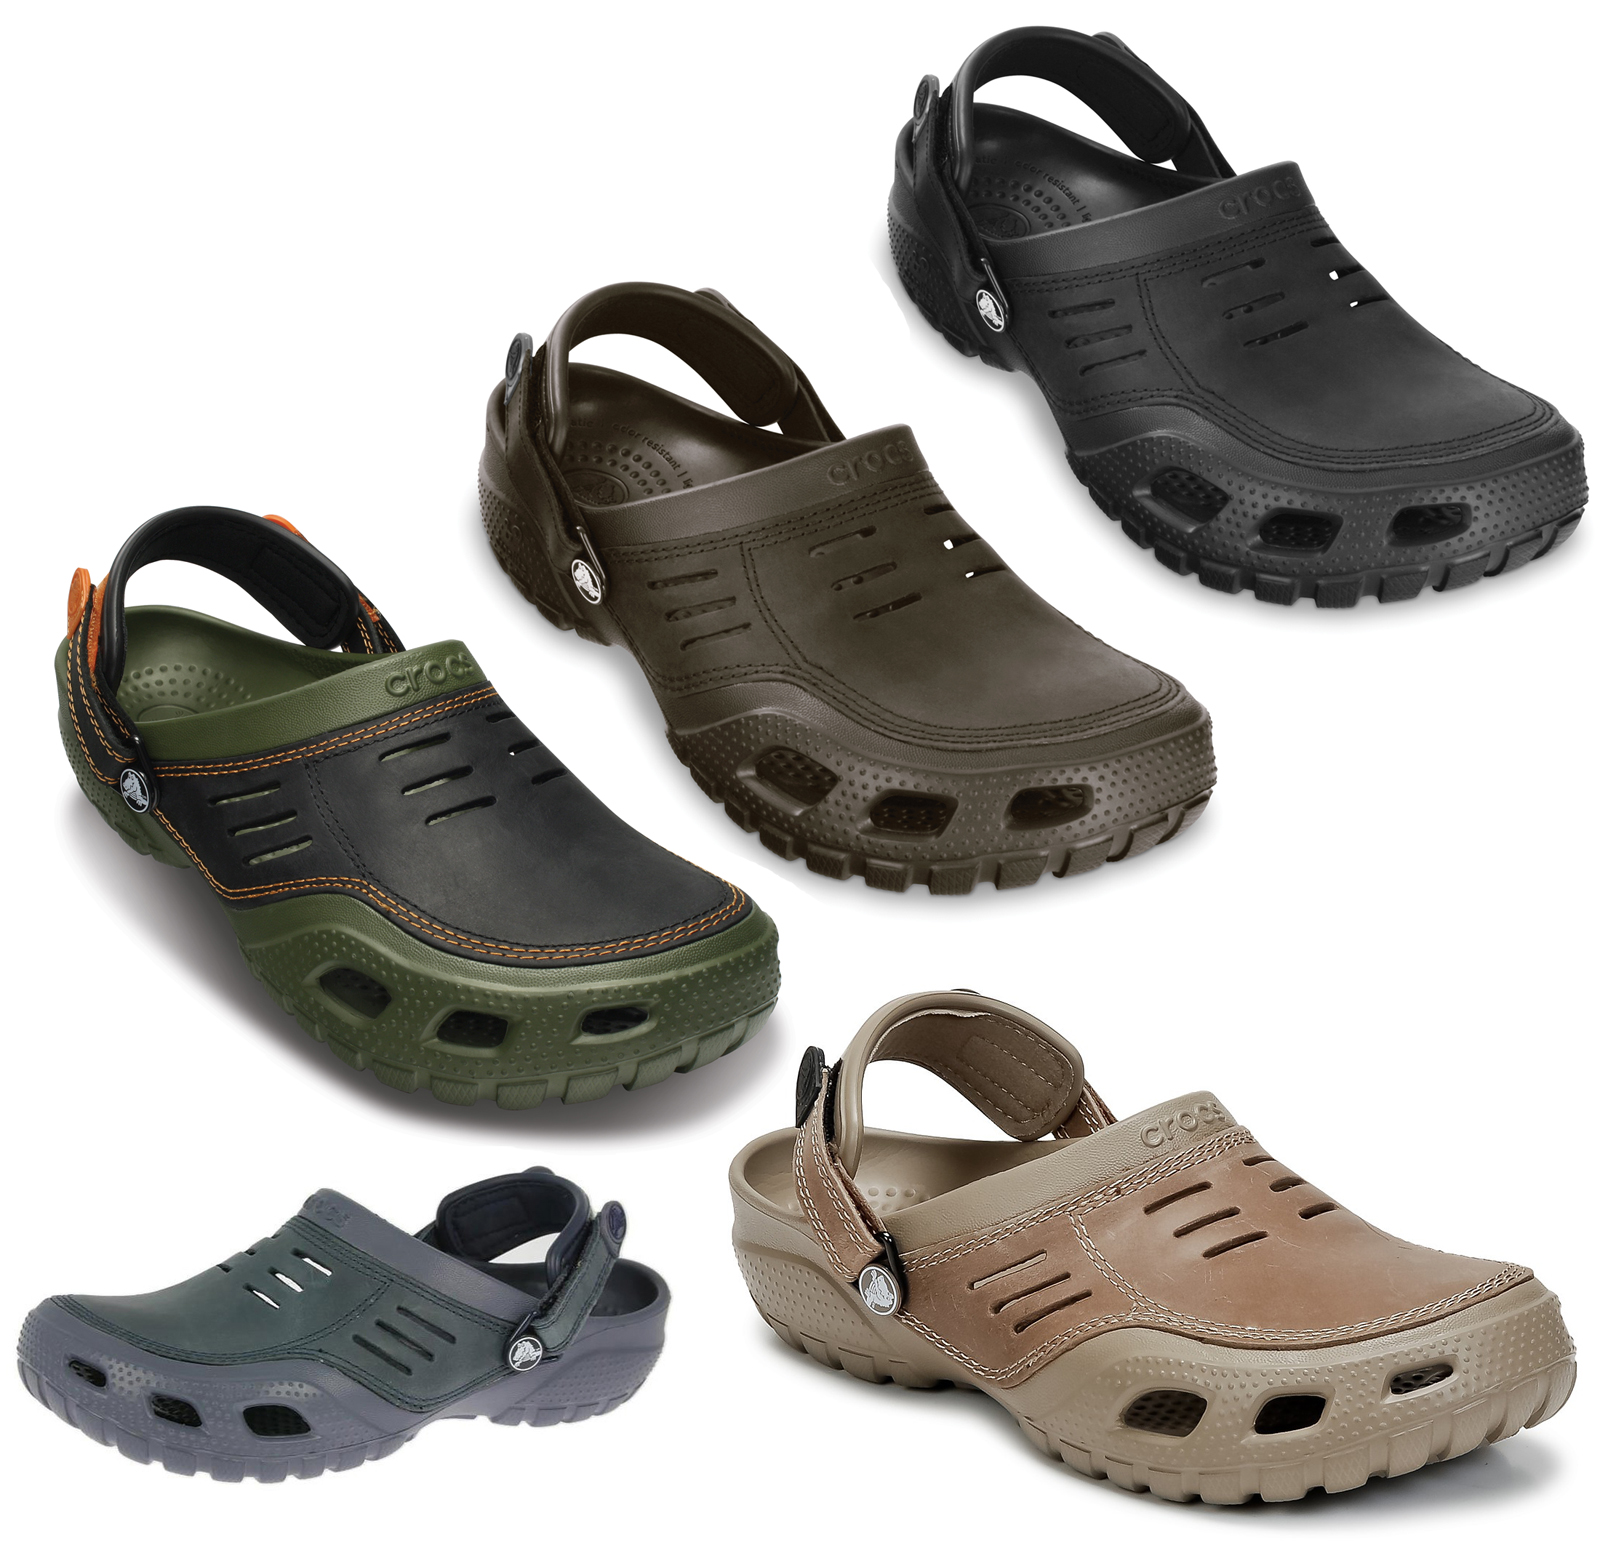 crocs sandals mens walking yukon clogs sports genuine comfort shoes